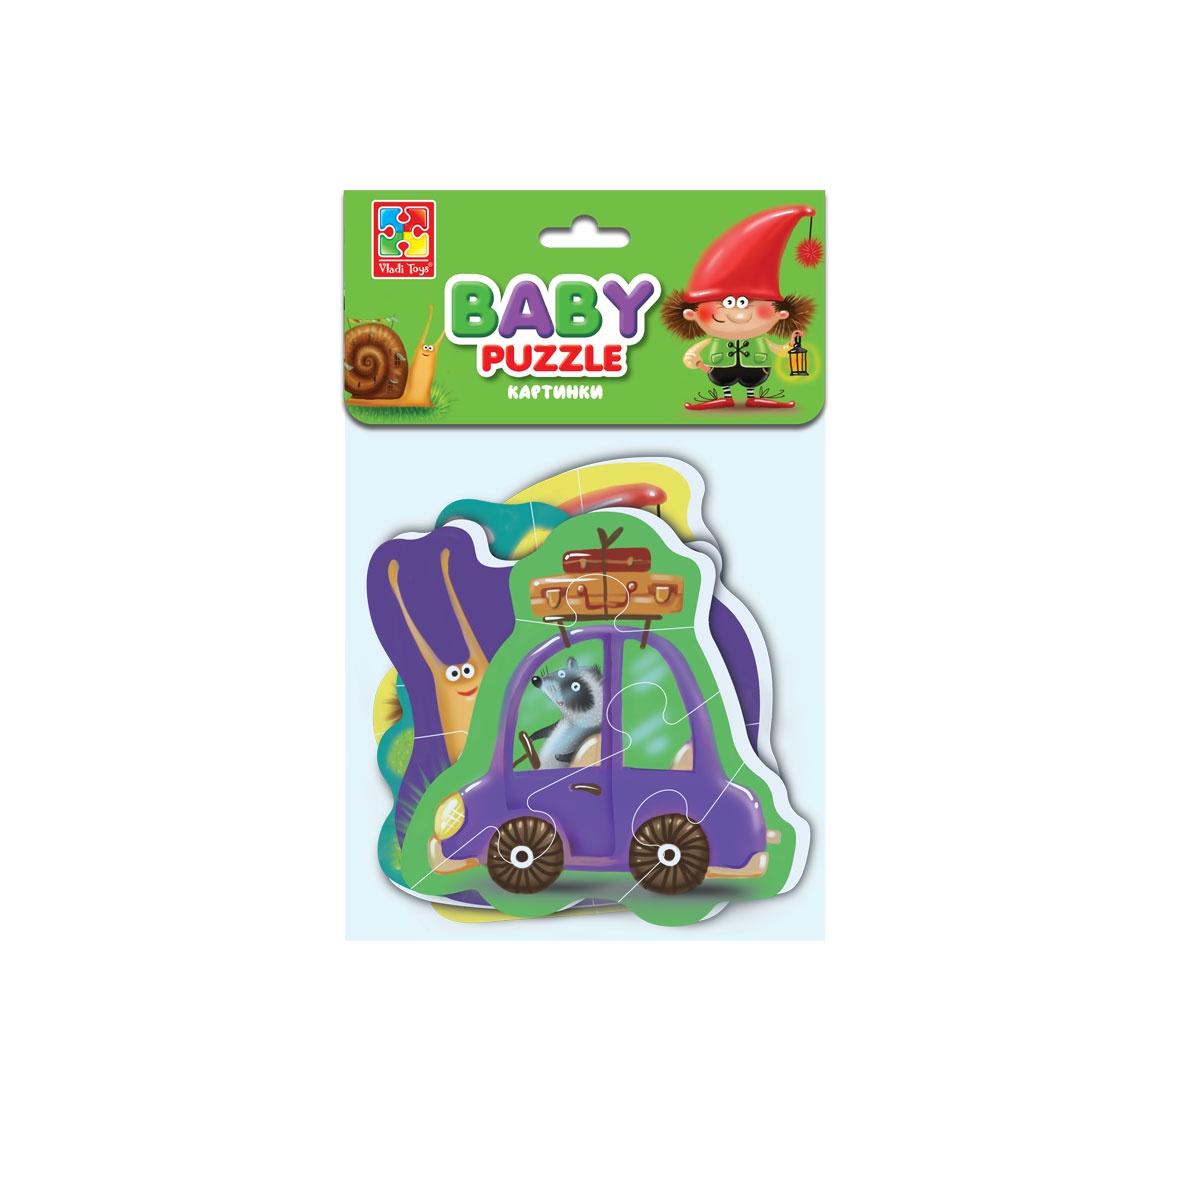 Мягкие пазлы Baby puzzle Картинки baby toys макси пазлы baby toys зигзаг домашние животные 18 элементов